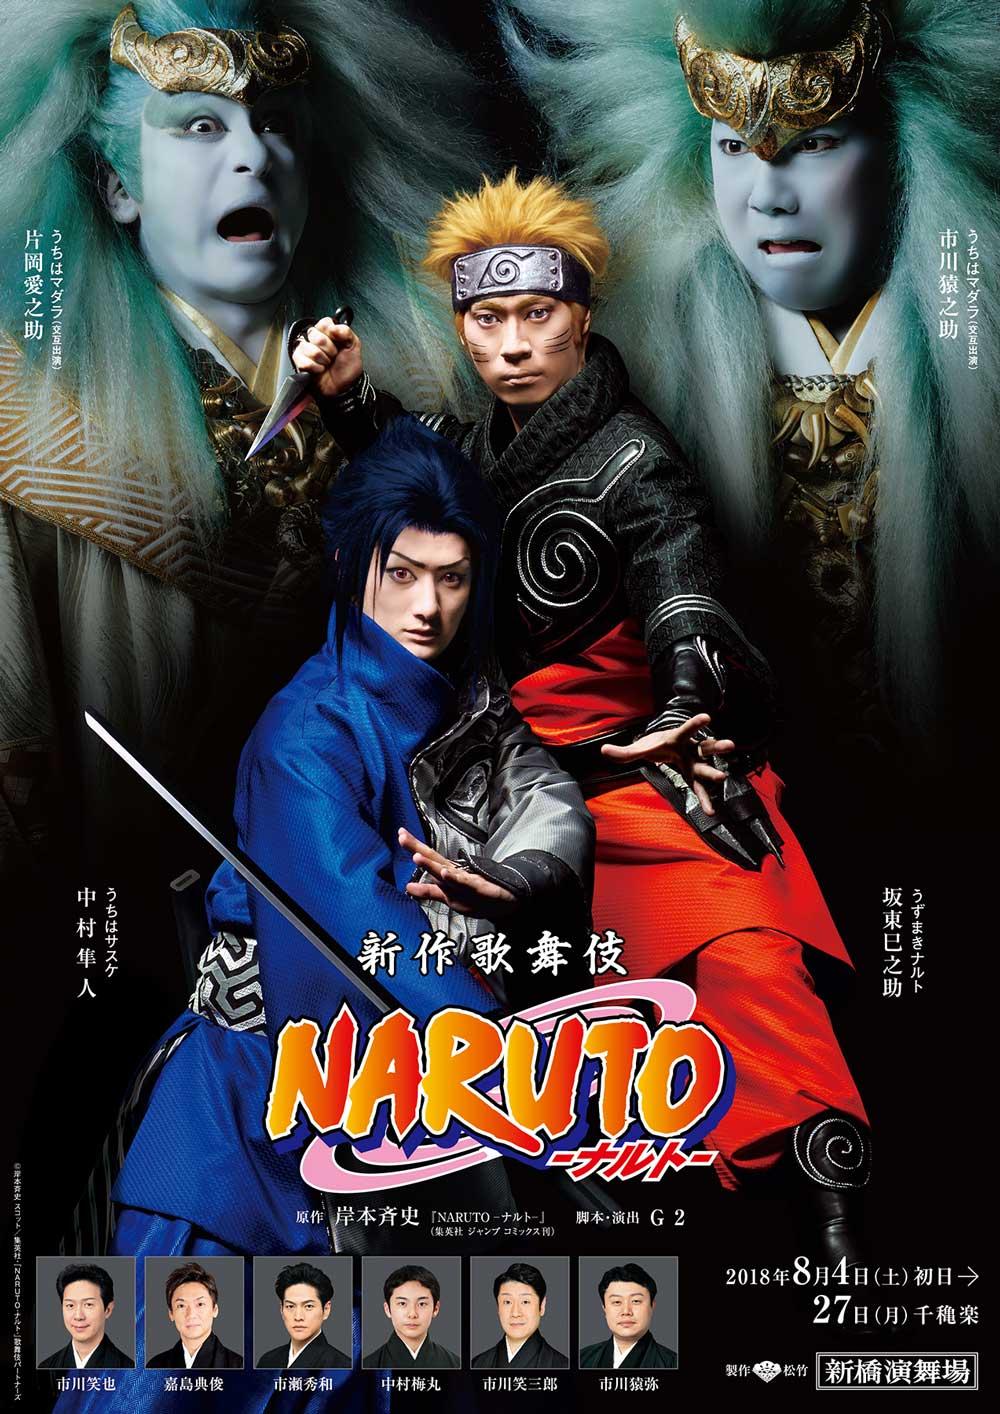 http://www.kabuki-bito.jp/uploads/images/kouen/556/shinbashi_201808_f5_60b3f3078388006e6b8cf69403b980f6.jpg